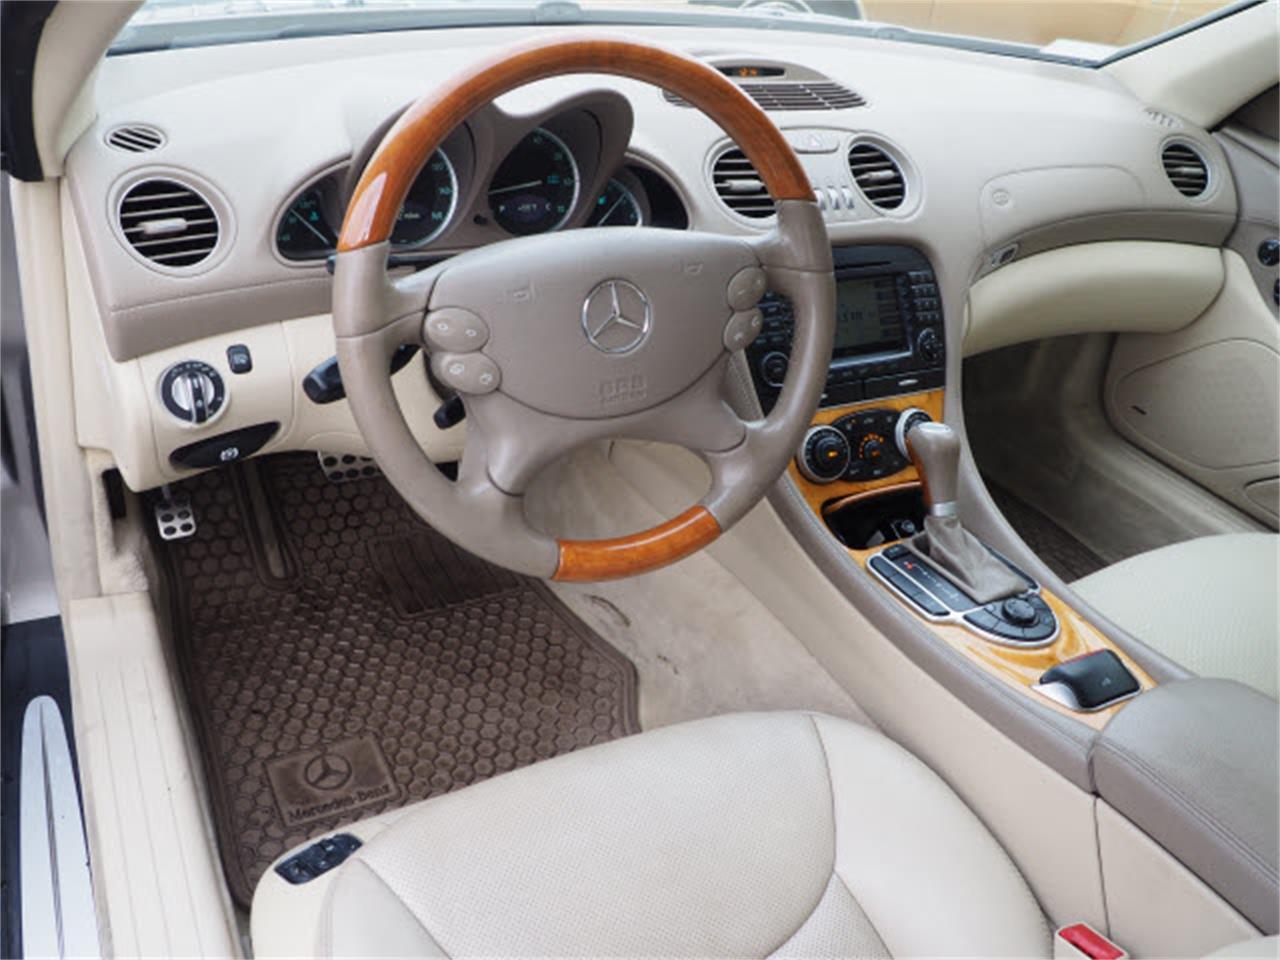 2005 Mercedes-Benz SL500 (CC-1274690) for sale in Tacoma, Washington